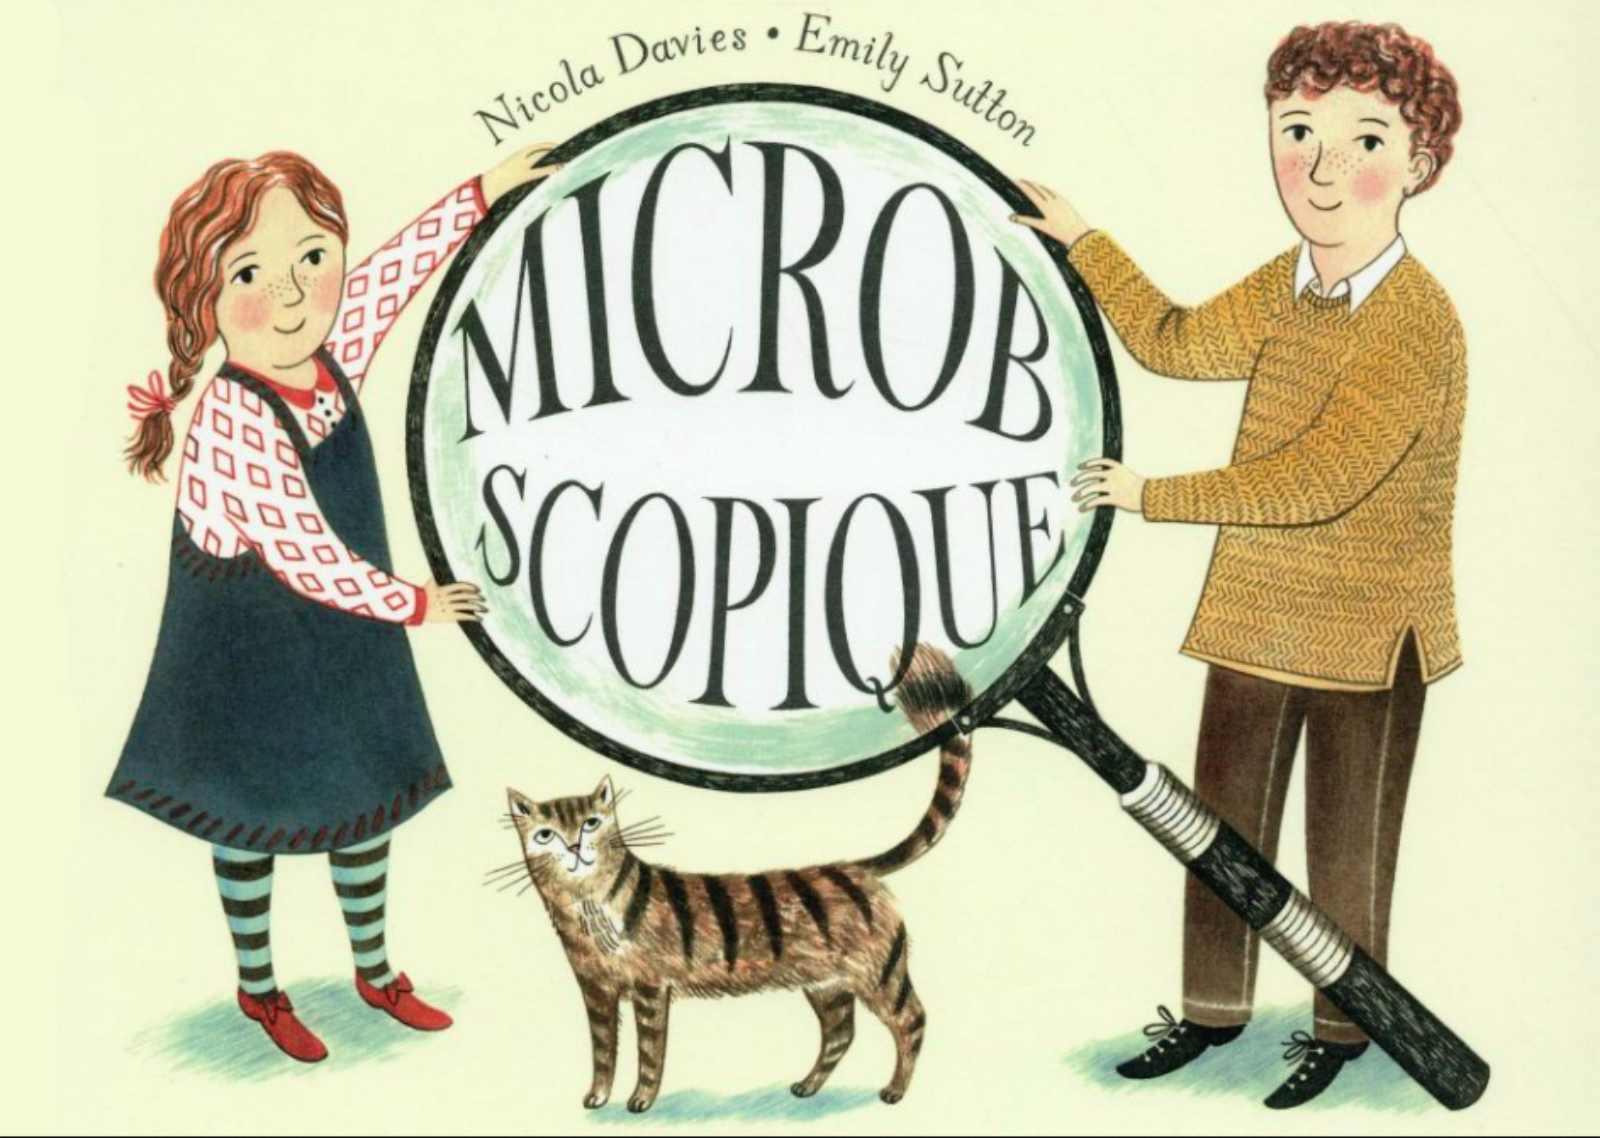 Microbscopique : le minimonde FASCINANT des microbes